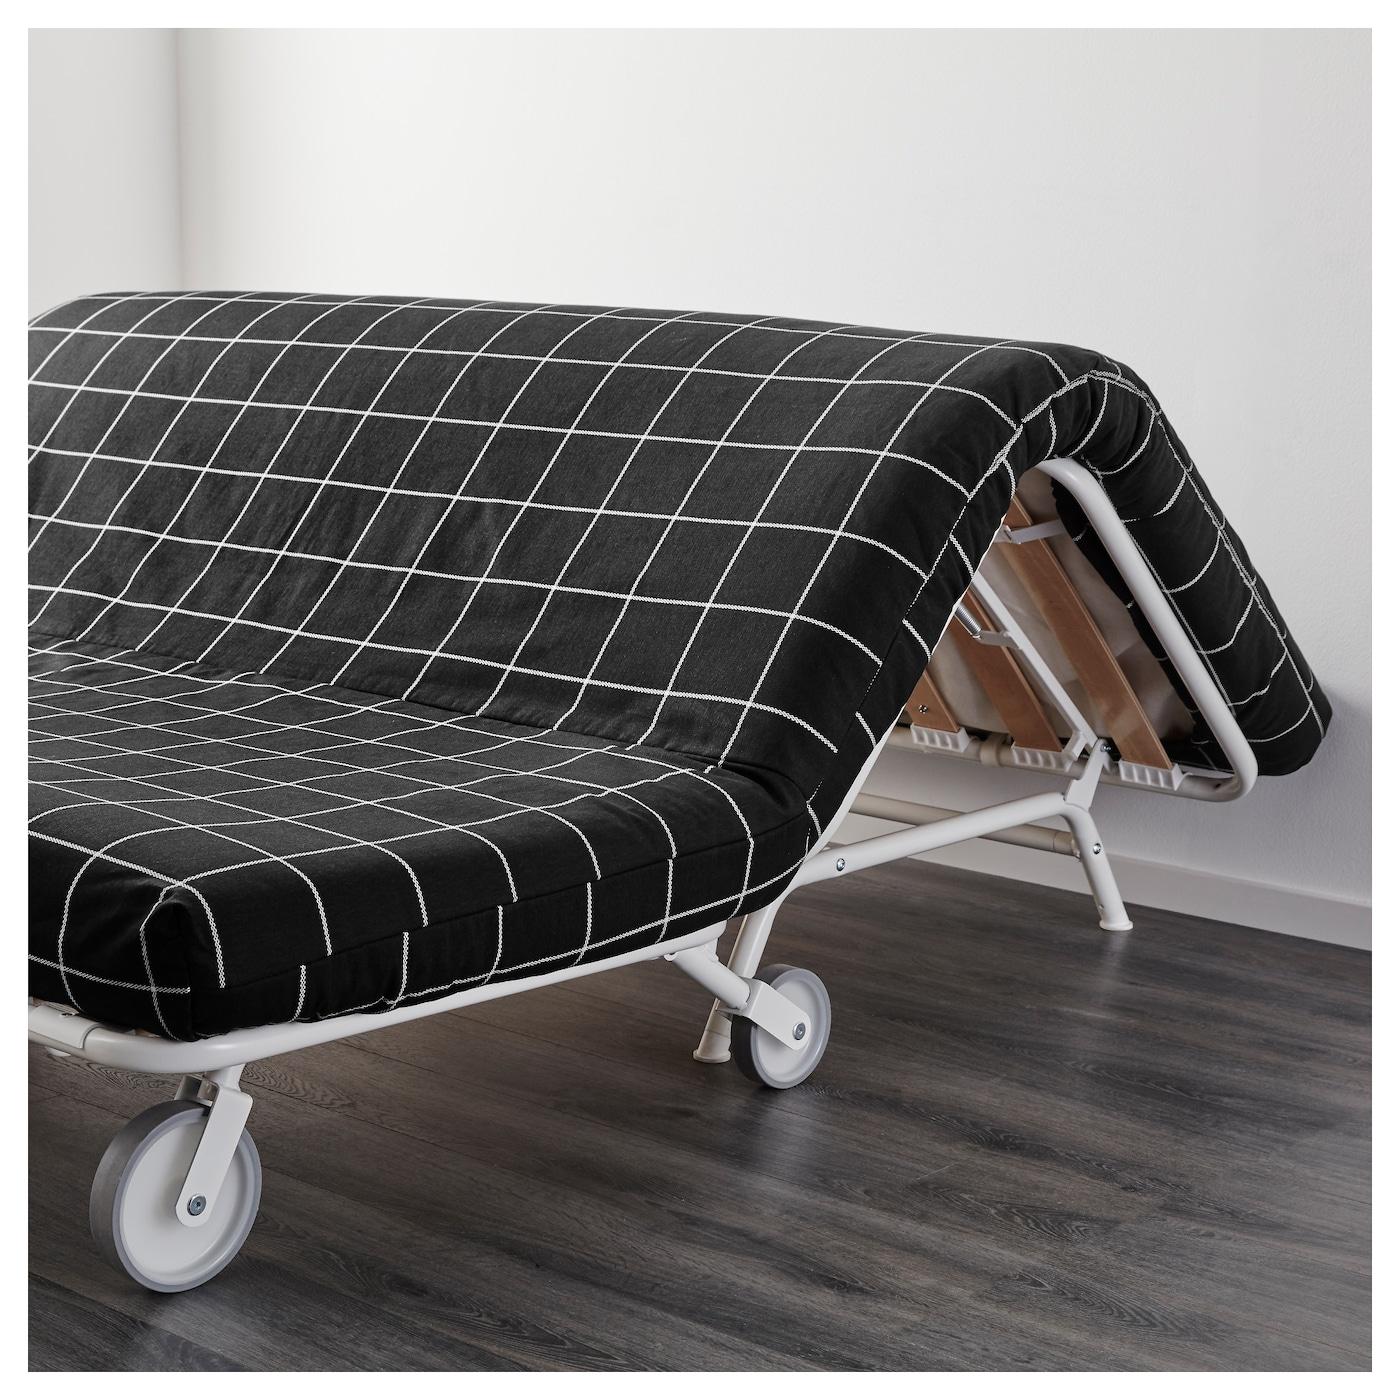 ikea ps l v s two seat sofa bed rute black ikea. Black Bedroom Furniture Sets. Home Design Ideas